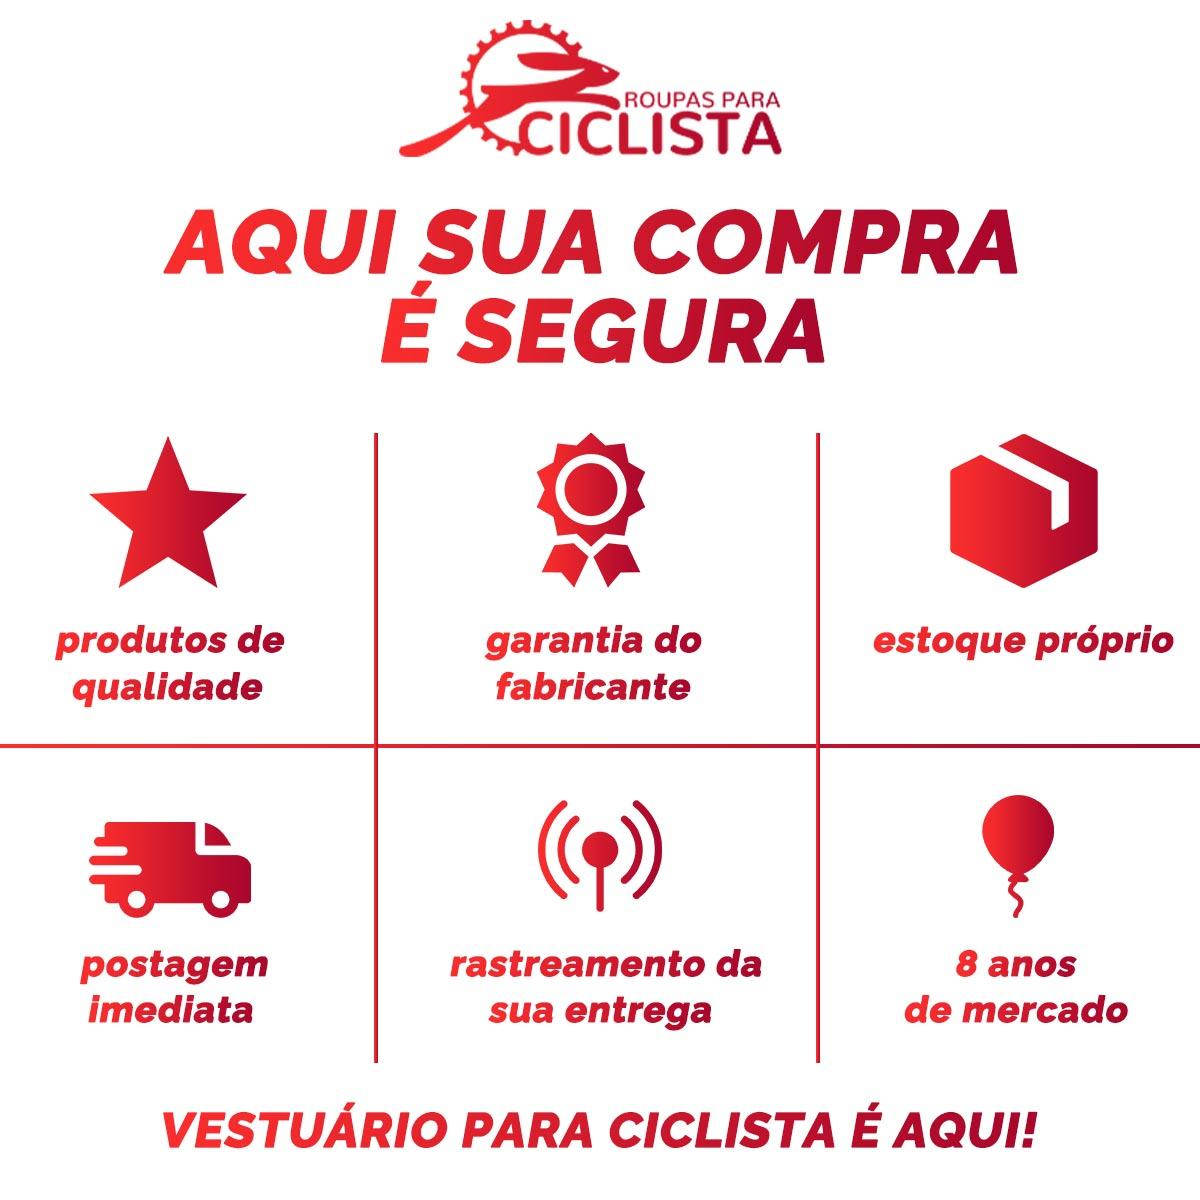 SAPATILHA MTB ABSOLUTE FEMININA LUNA PRETA E ROSA 2 VELCROS E CATRACA - ISP